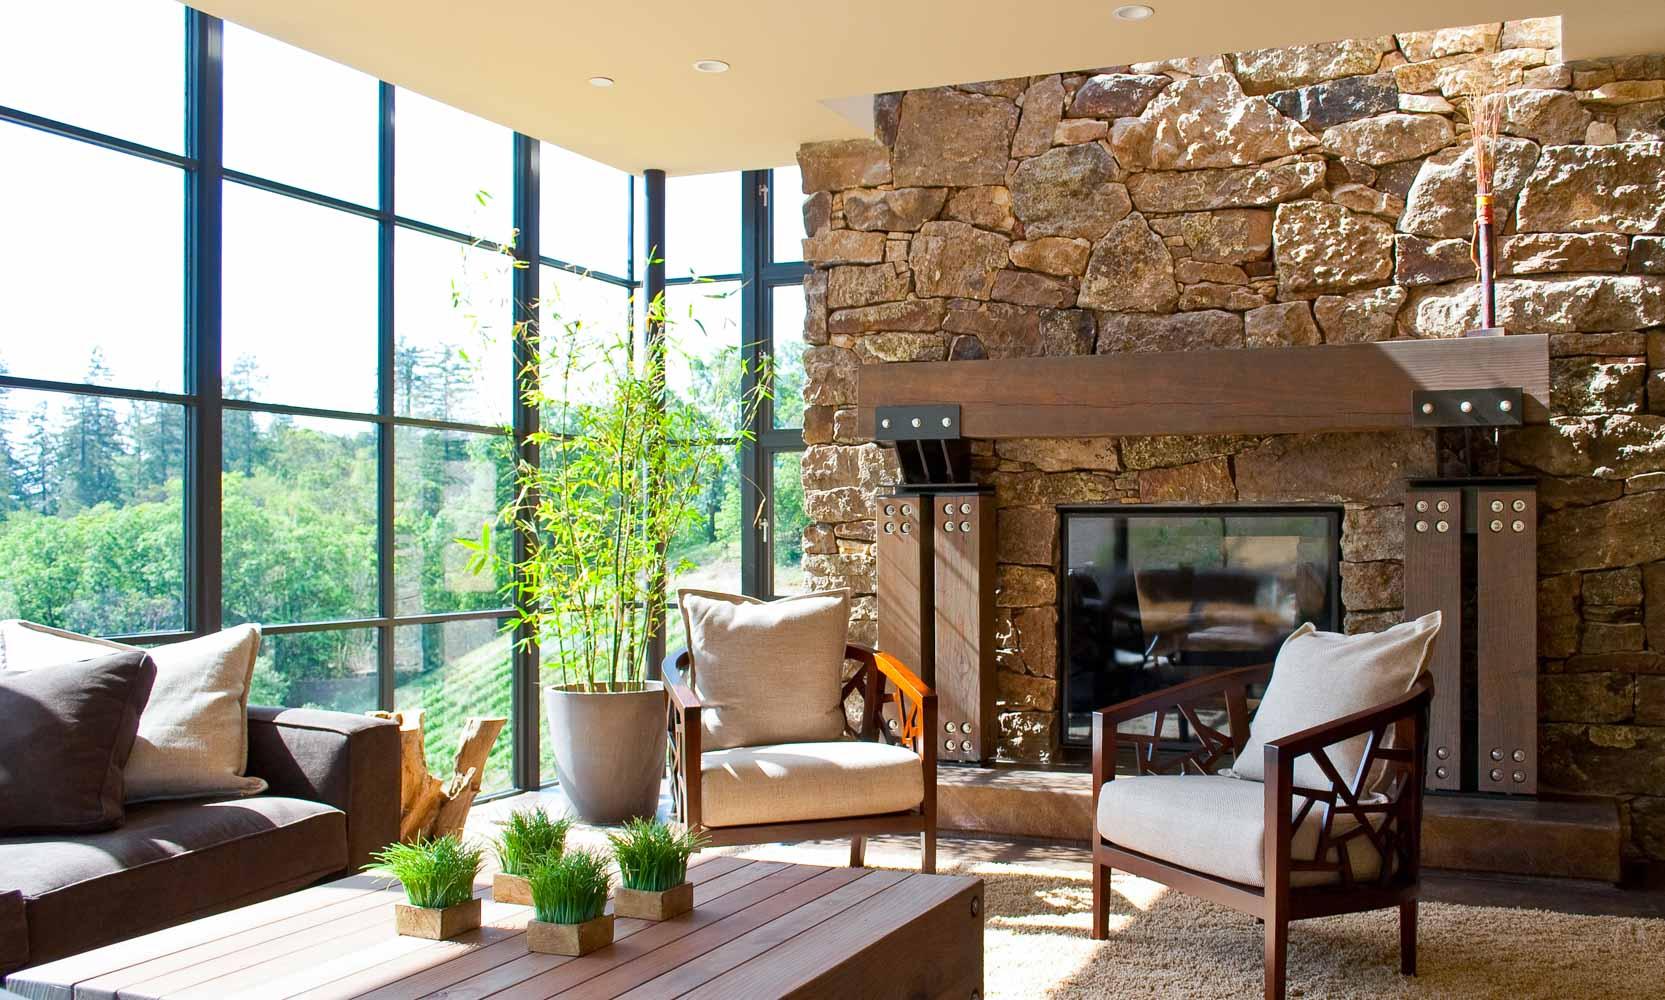 Bon California Modern Mountain House Living Room By Bjella Architects, Calabasas